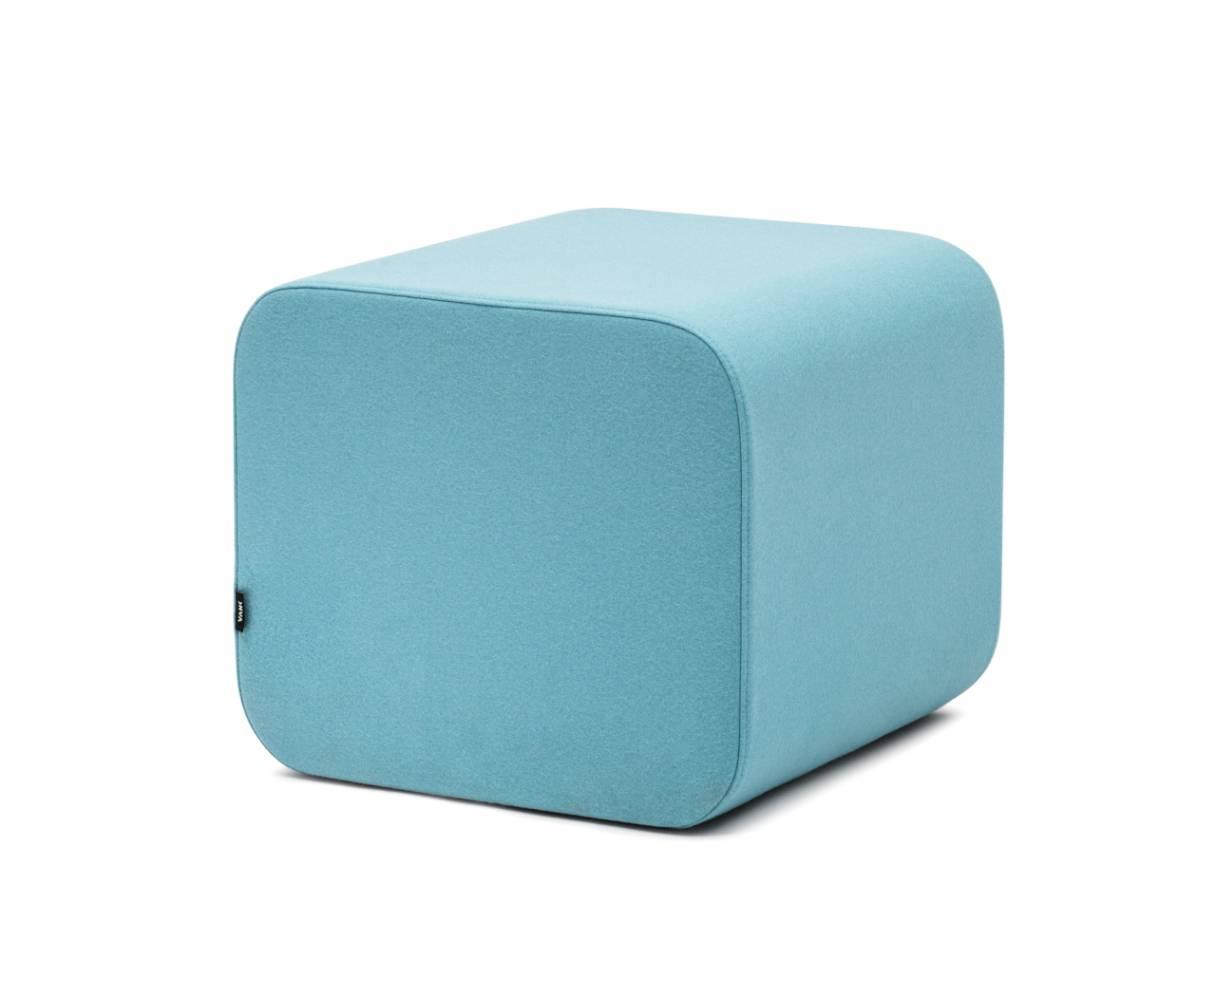 VANK Celoo Pouf Design Möbel